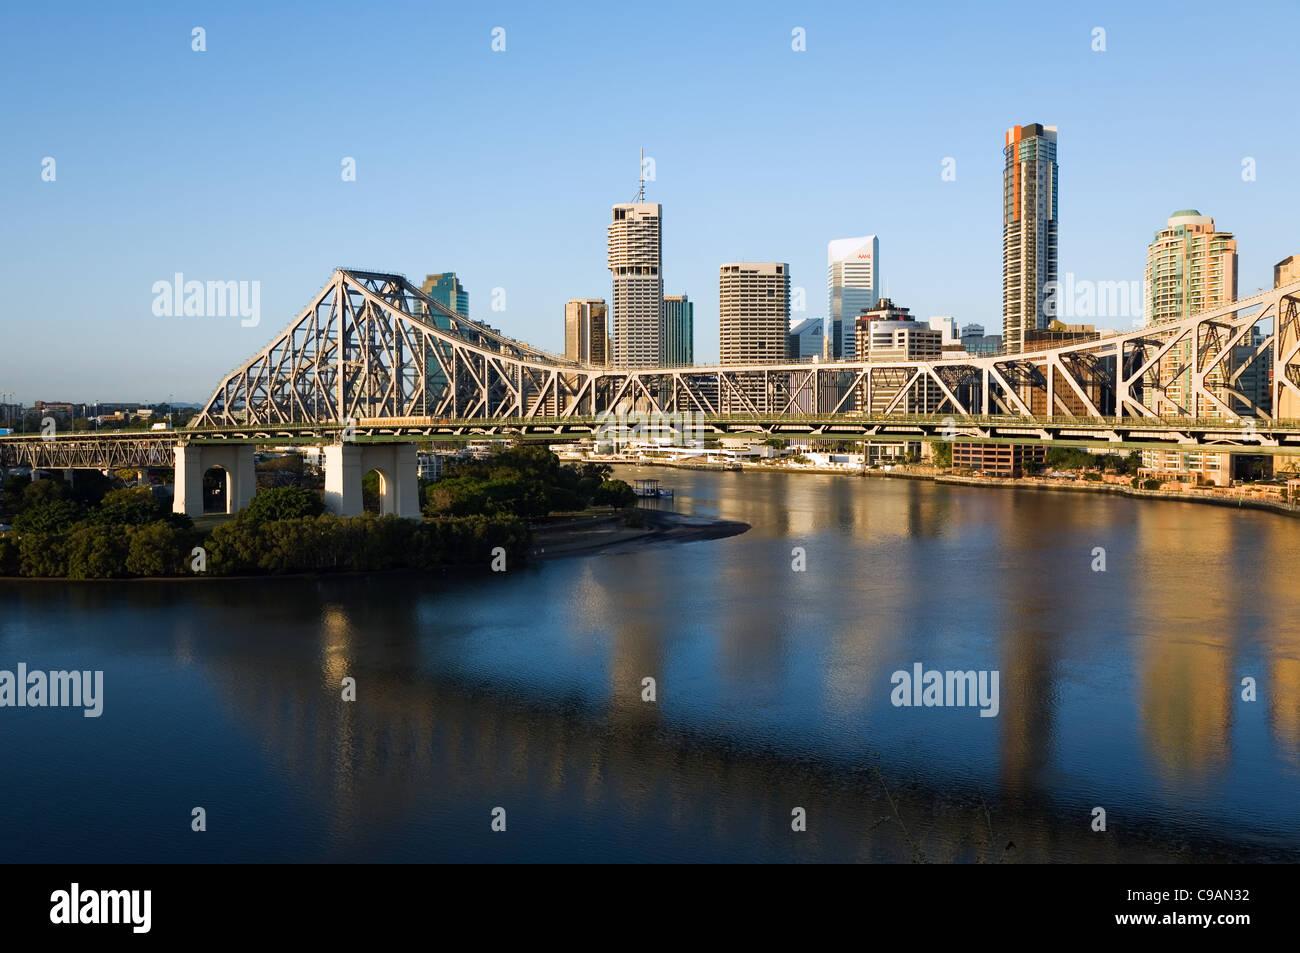 Story Bridge and central business district along the Brisbane River.  Brisbane, Queensland, Australia - Stock Image